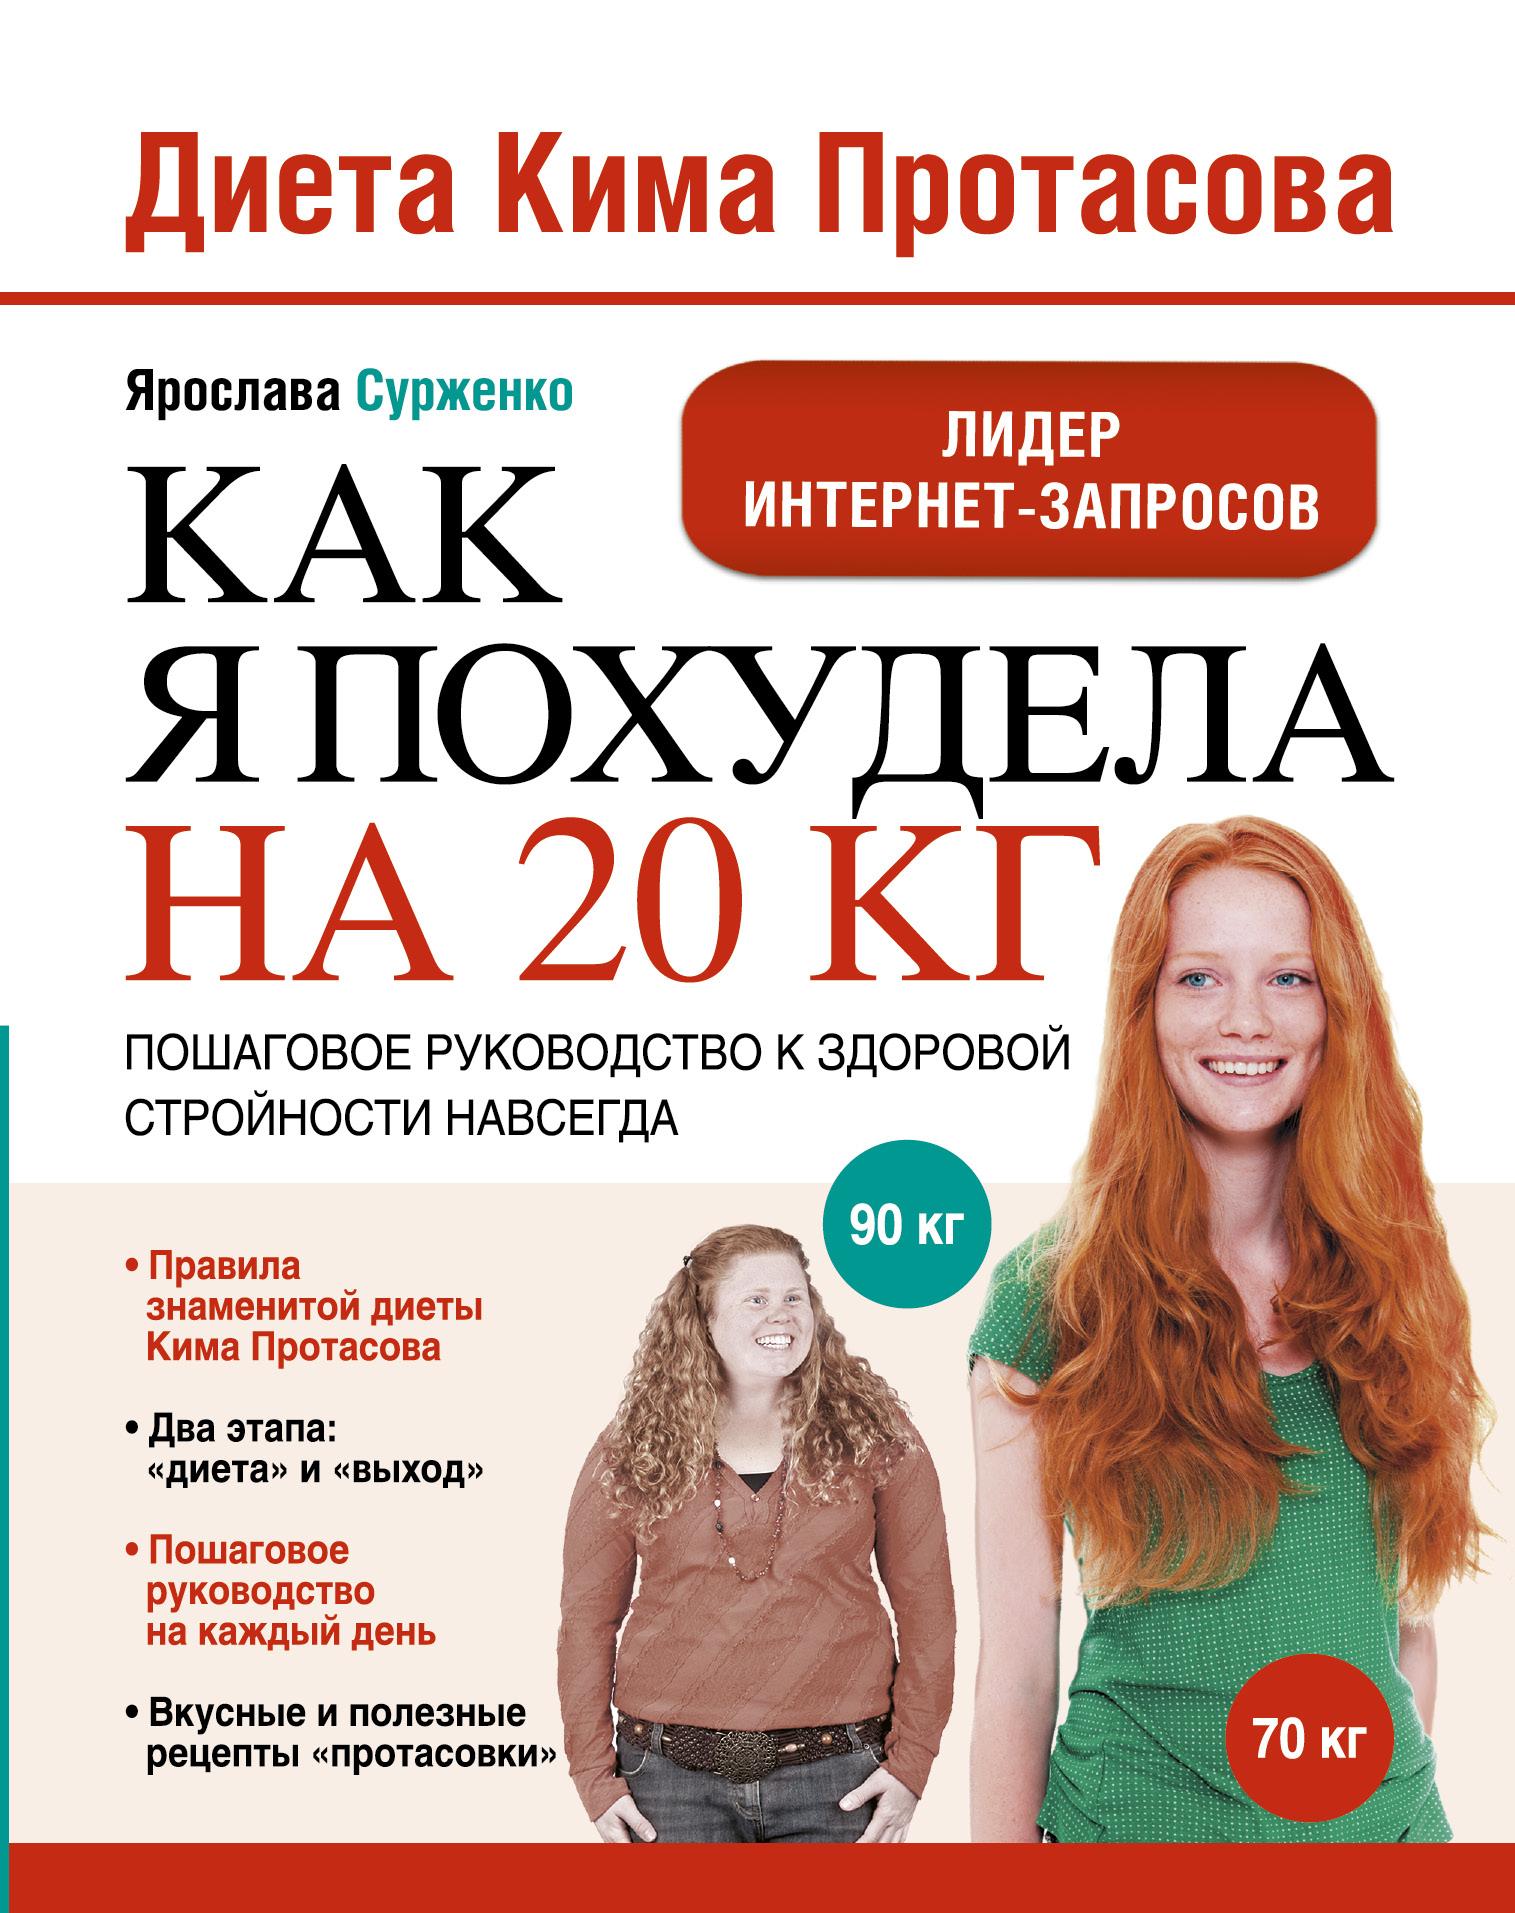 тарасова татьяна анатольевна похудела-15